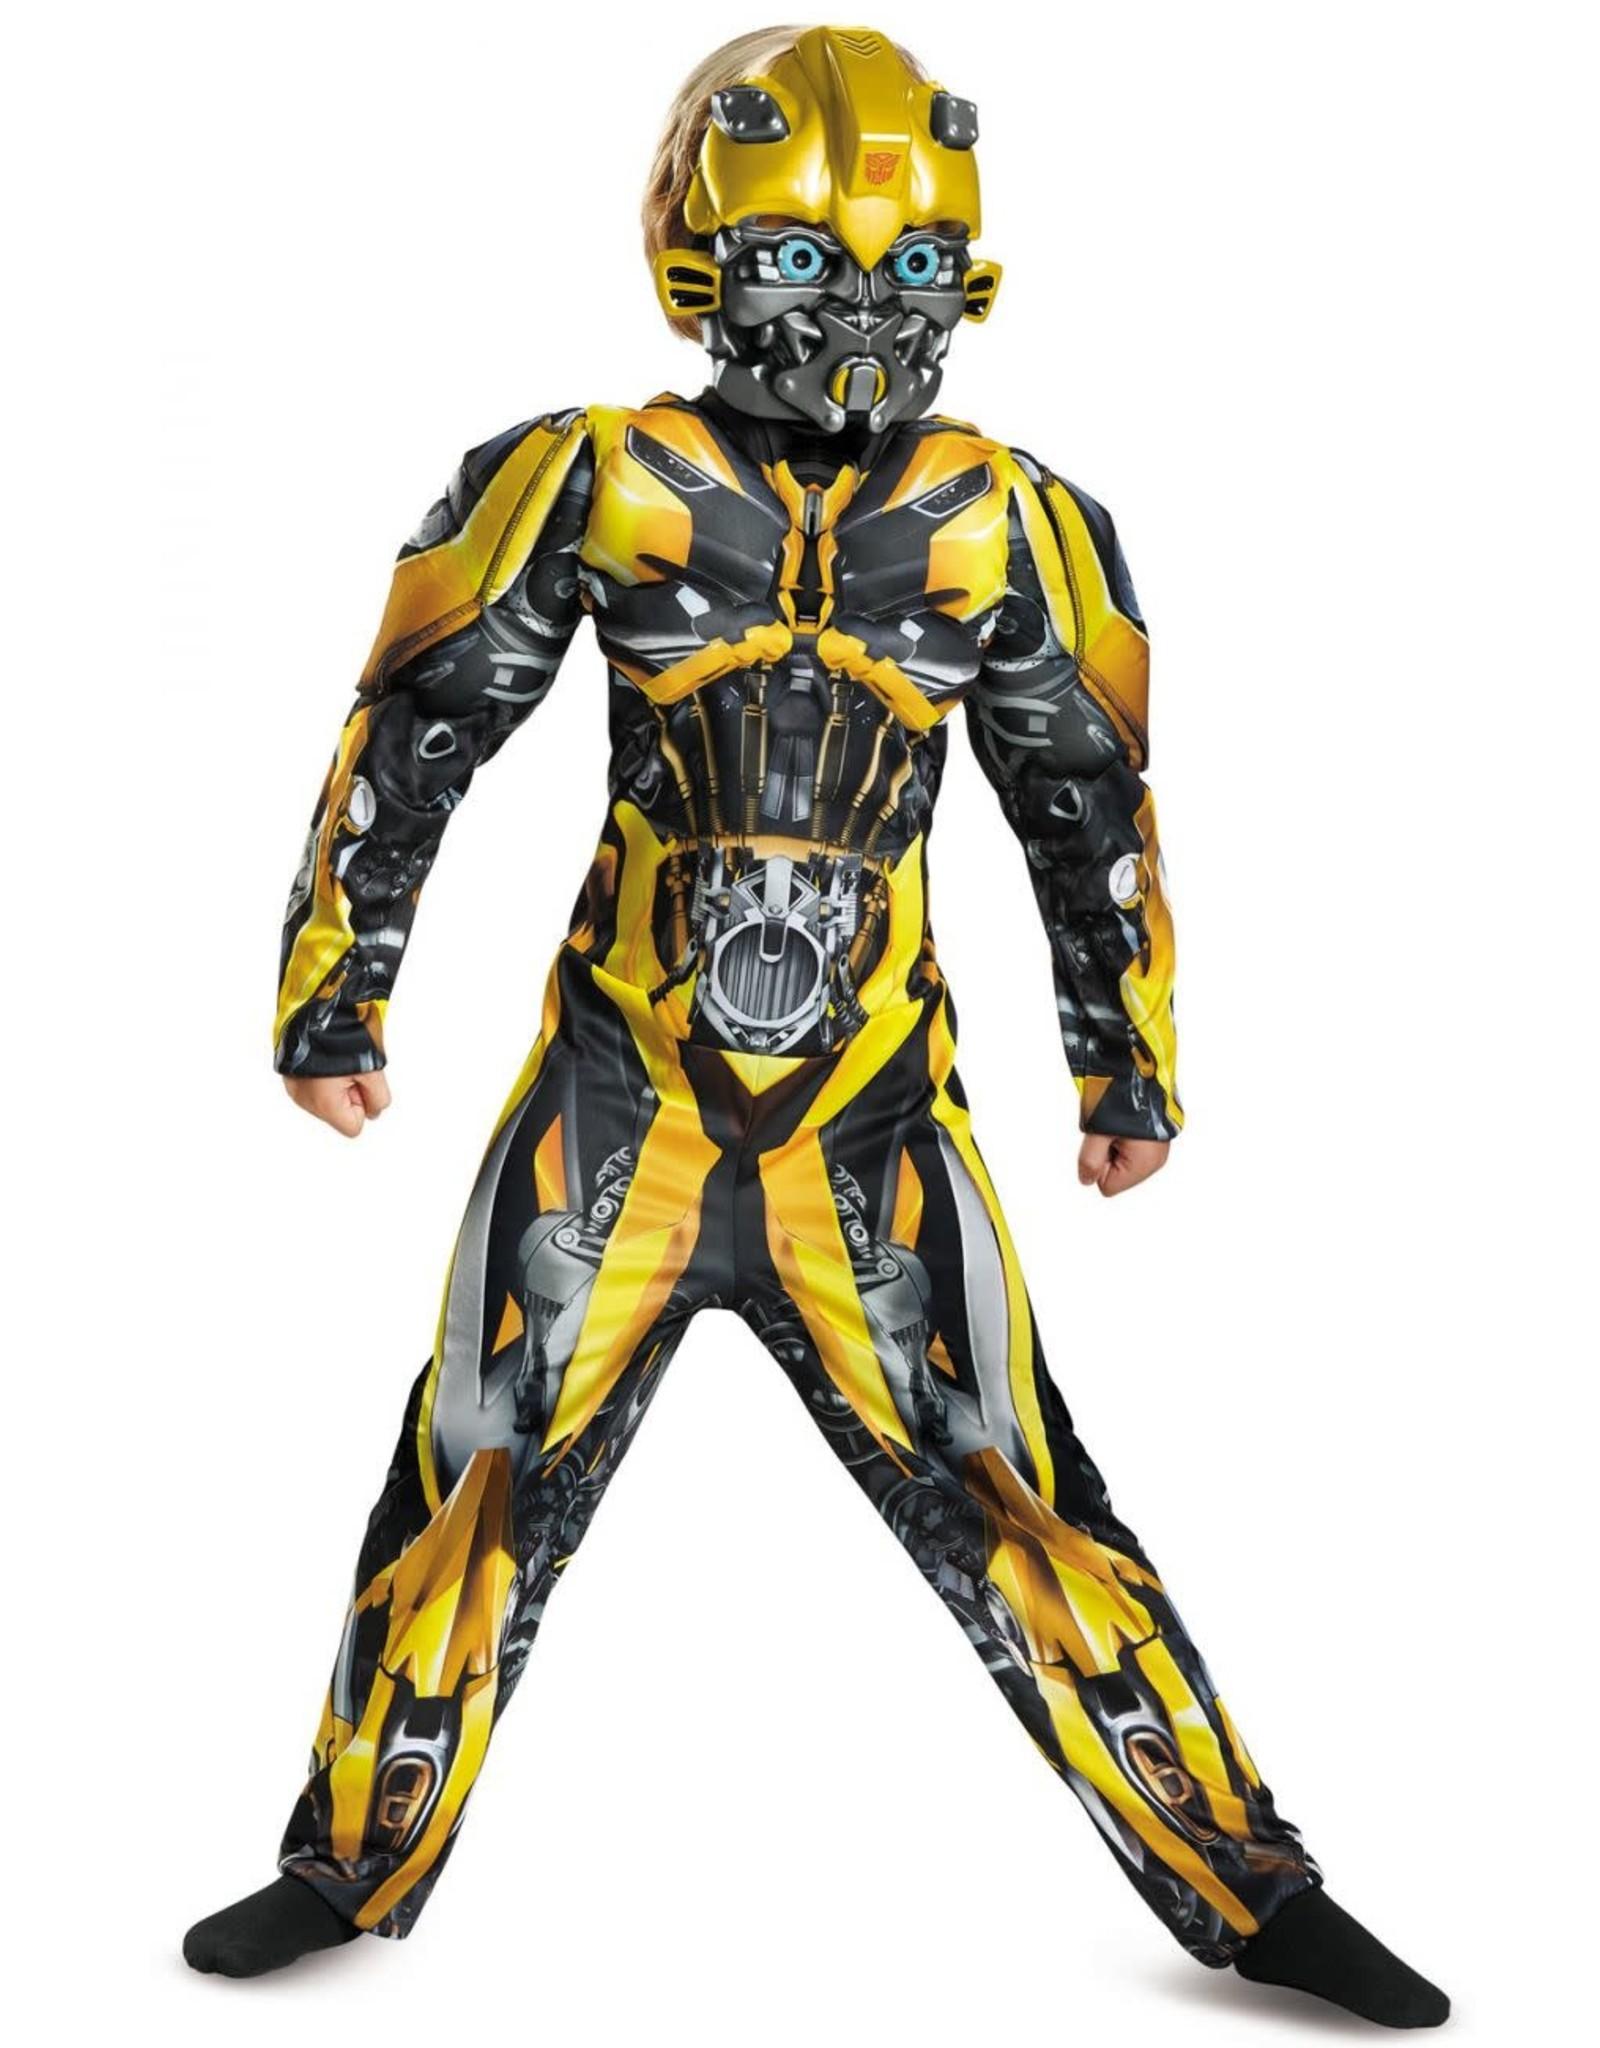 Disguise Bumblebee